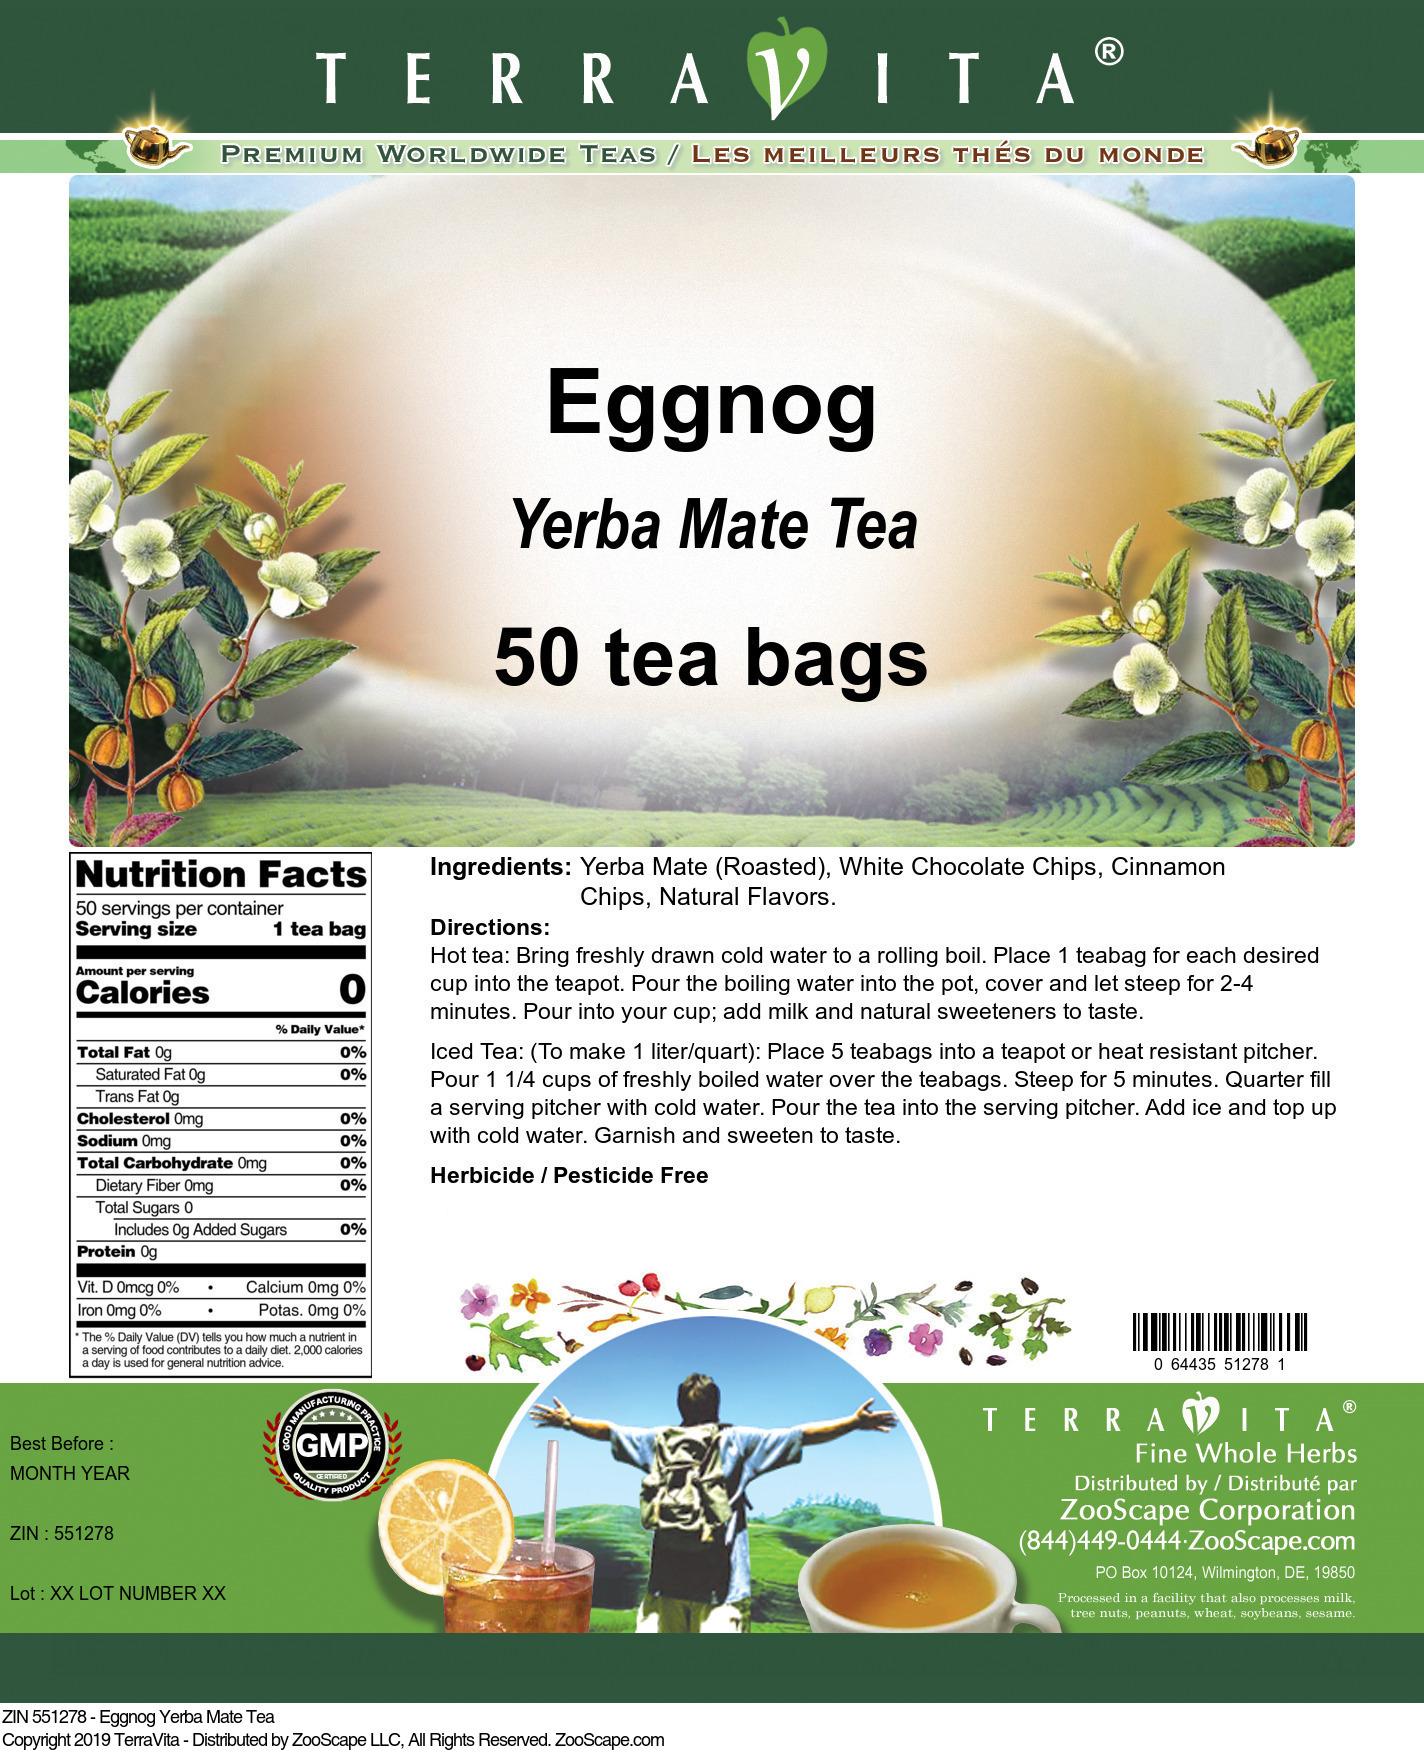 Eggnog Yerba Mate Tea